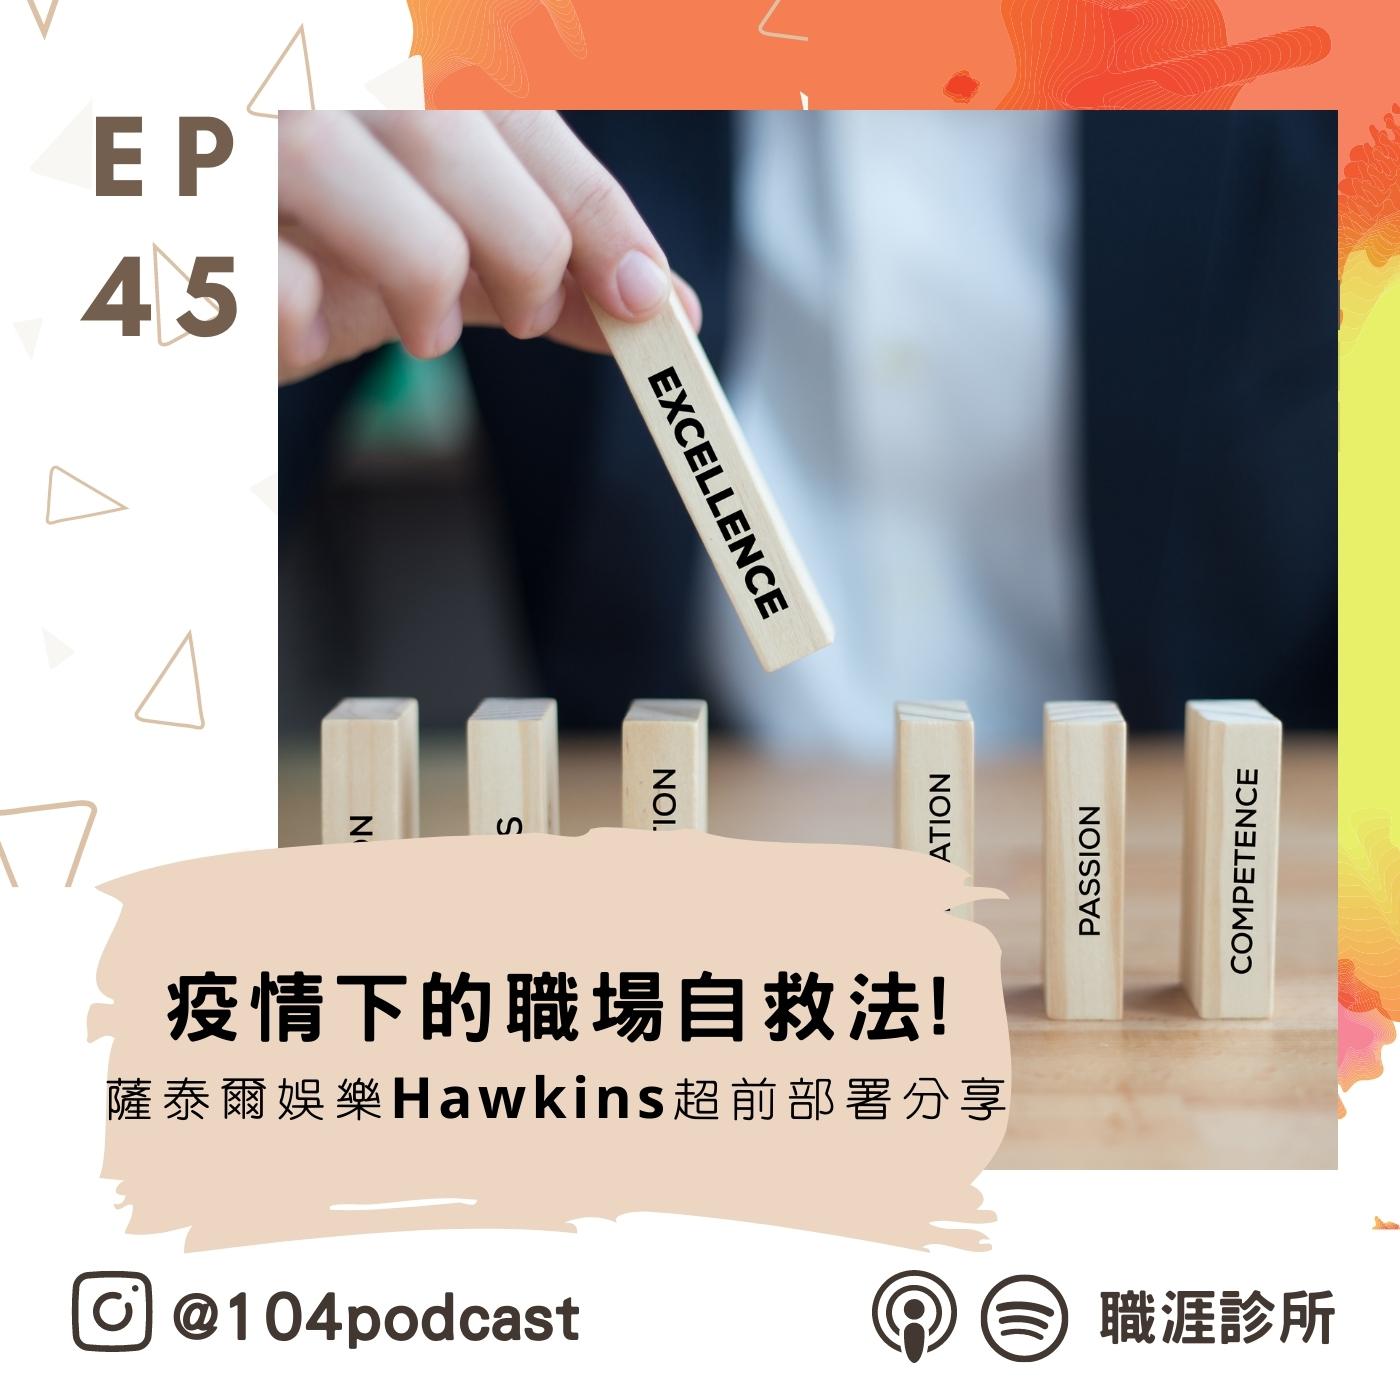 EP45 疫情下的職場自救法!薩泰爾娛樂Hawkins超前部署分享~ Live on Clubhouse(下集)